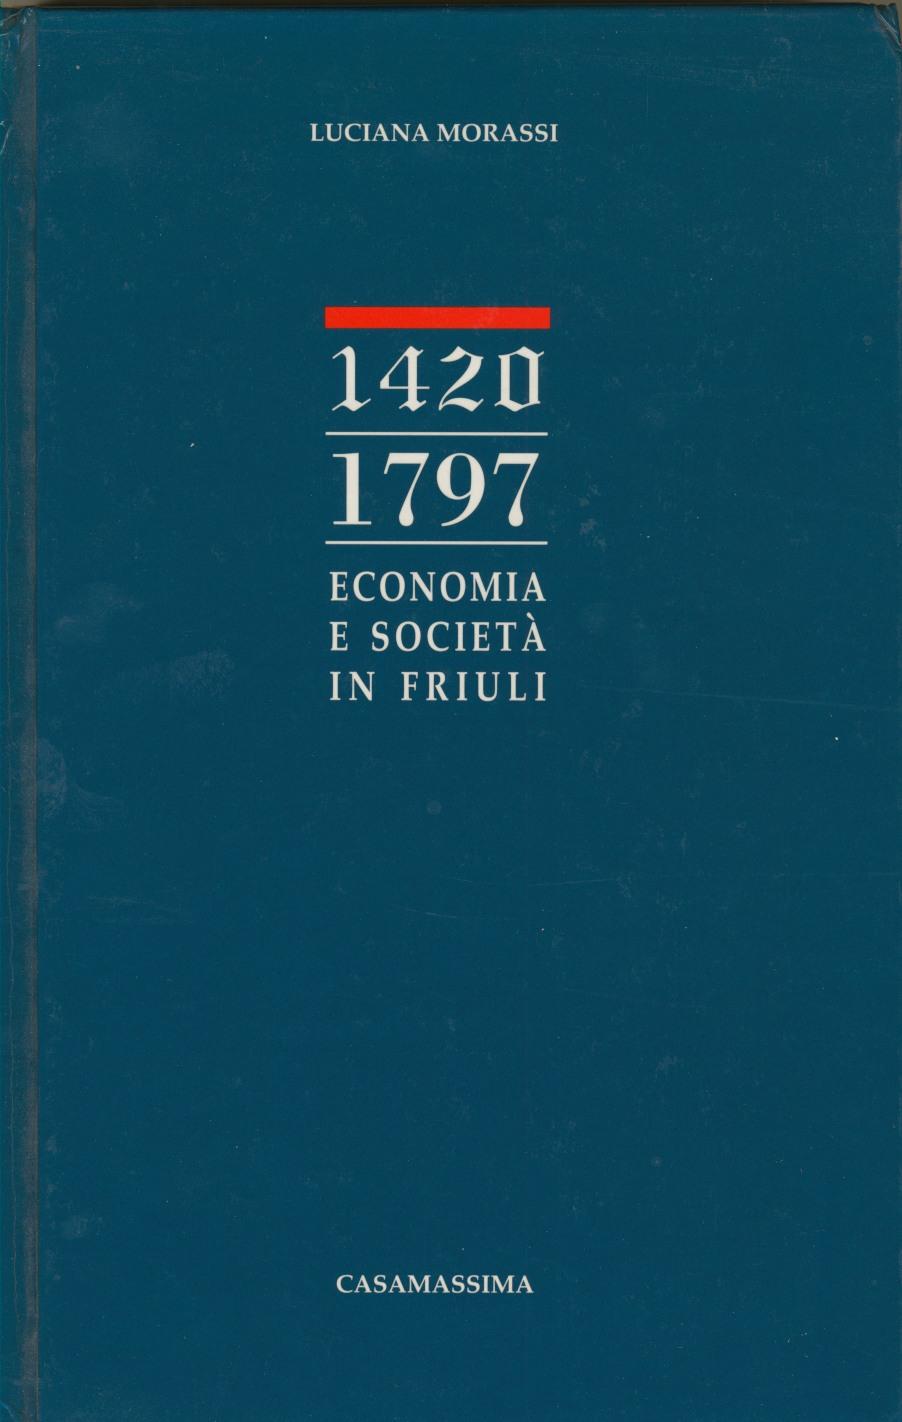 1420-1797